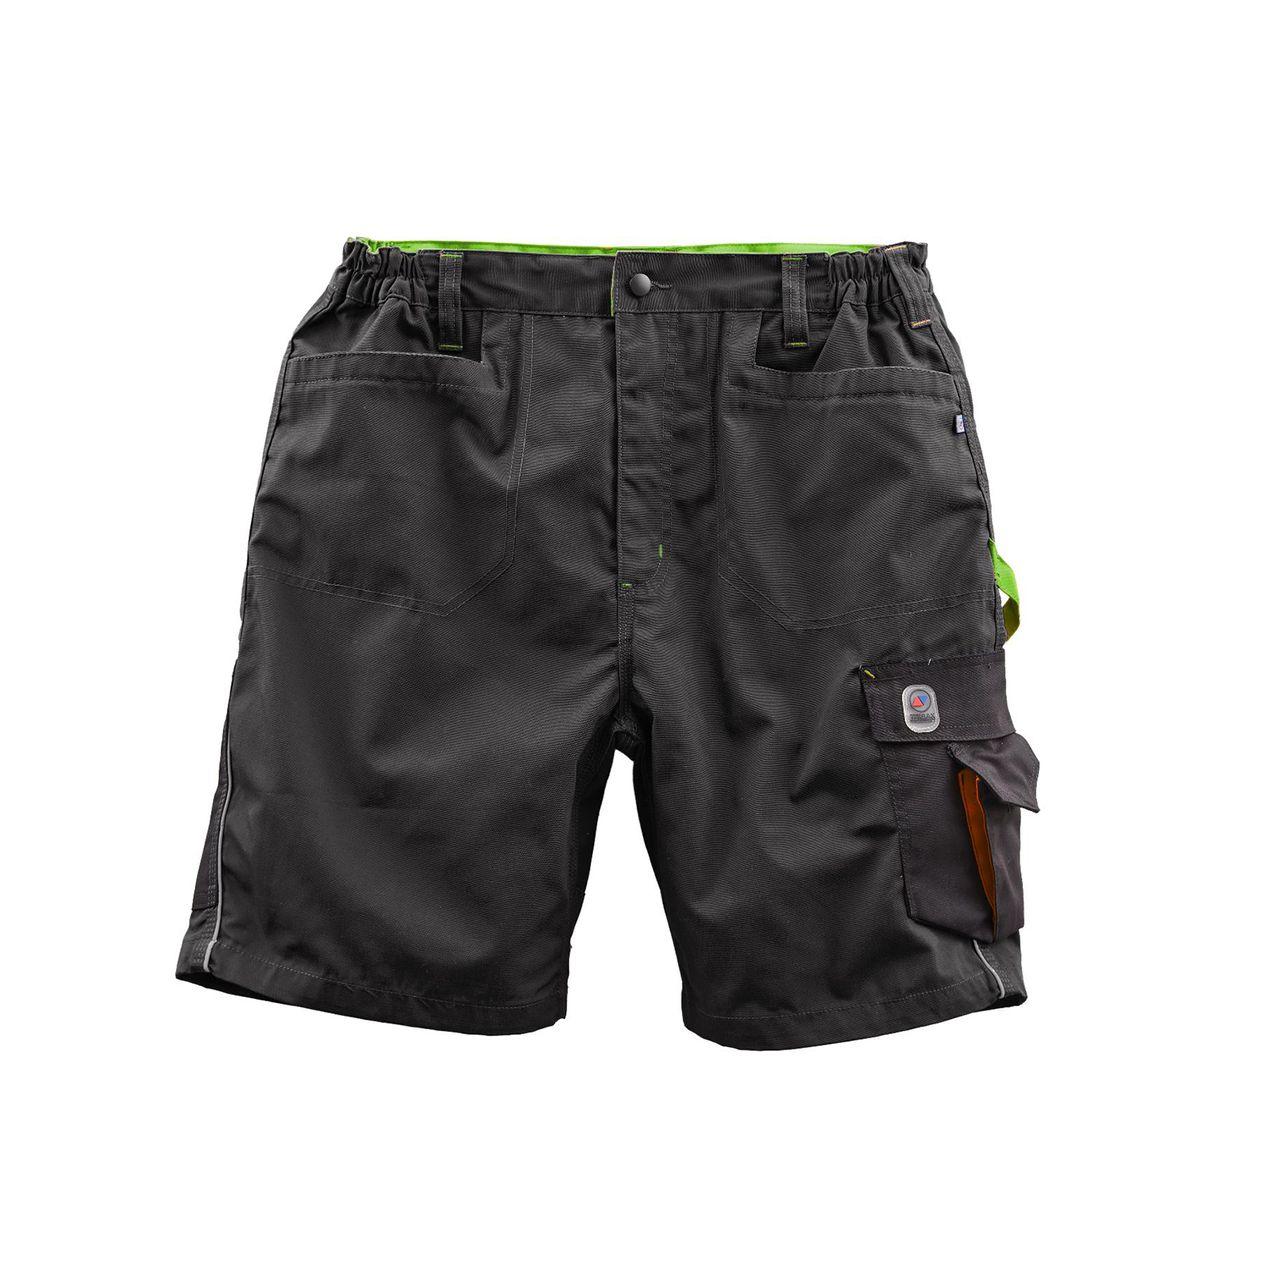 TERRAX WORKWEAR Herren Shorts, Schwarz/Limette